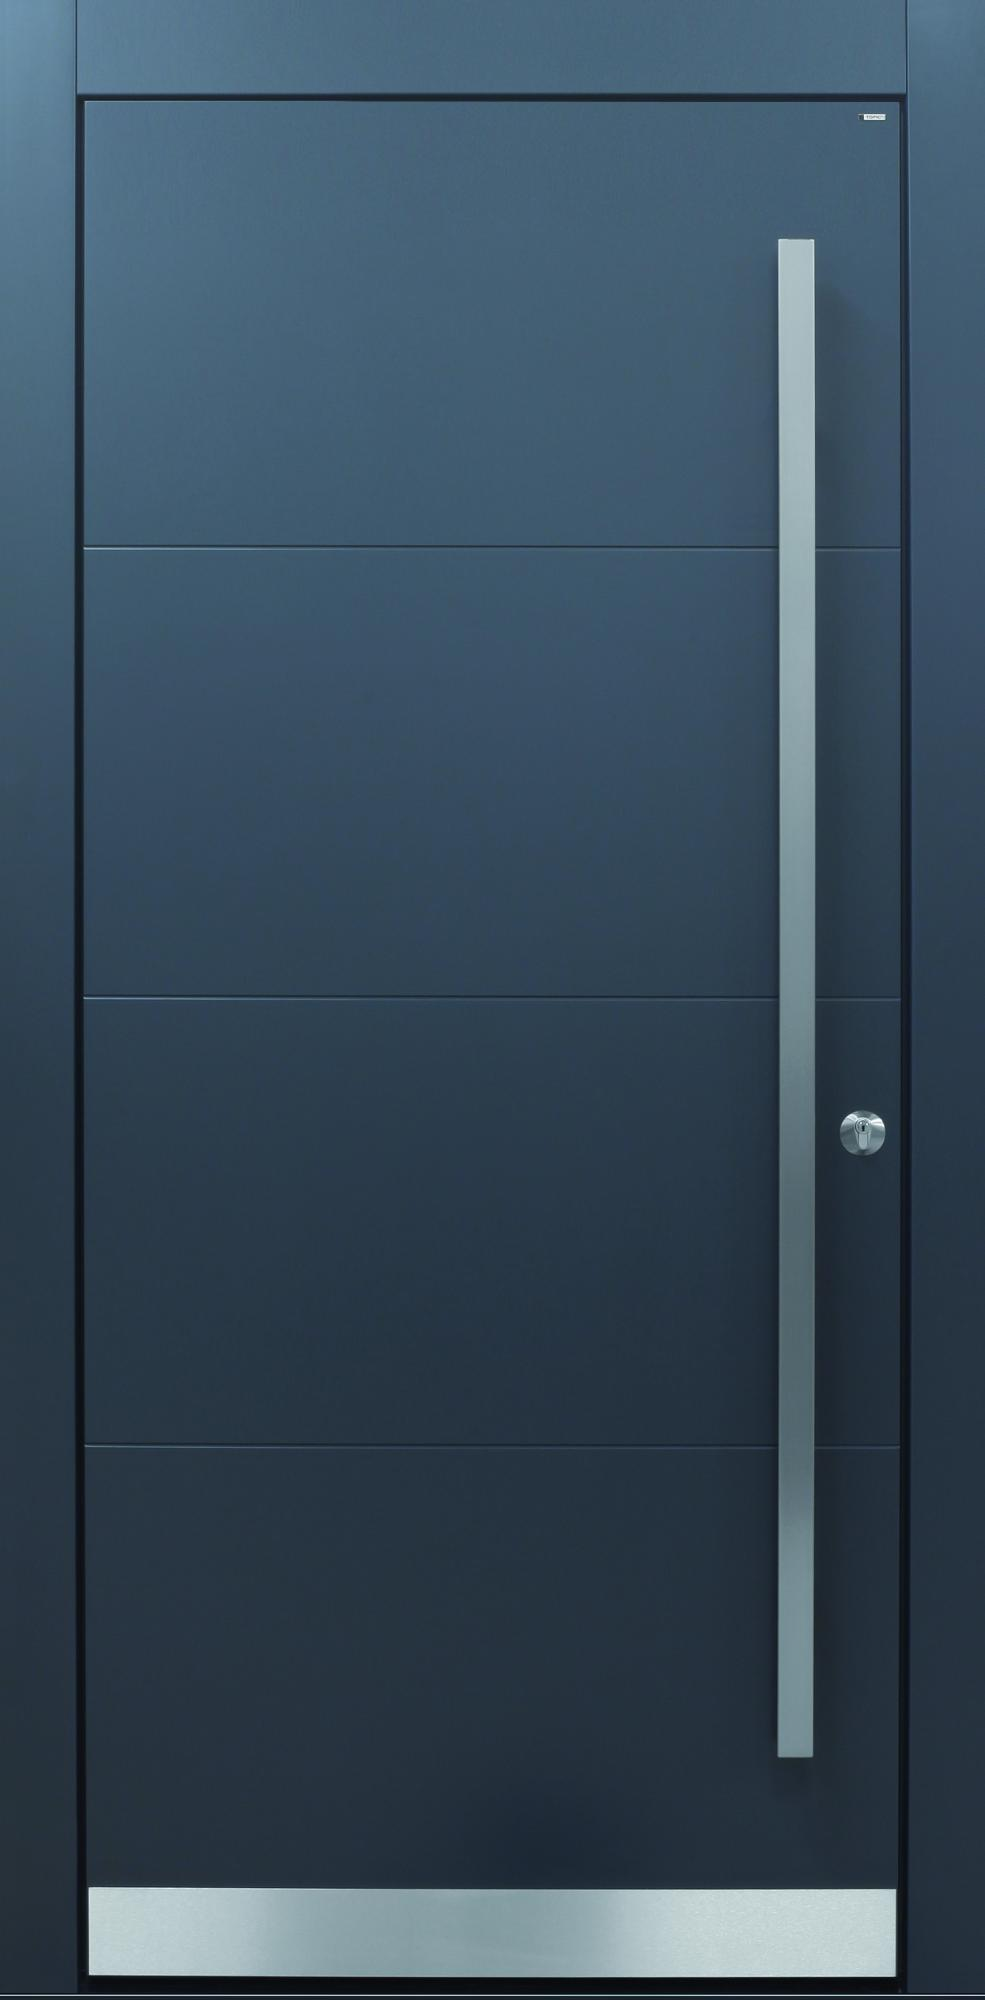 Haustüren anthrazit modern  TOPIC - Haustüren von Meisterhand TOPIC Haustüren u. Wohnungstüren ...